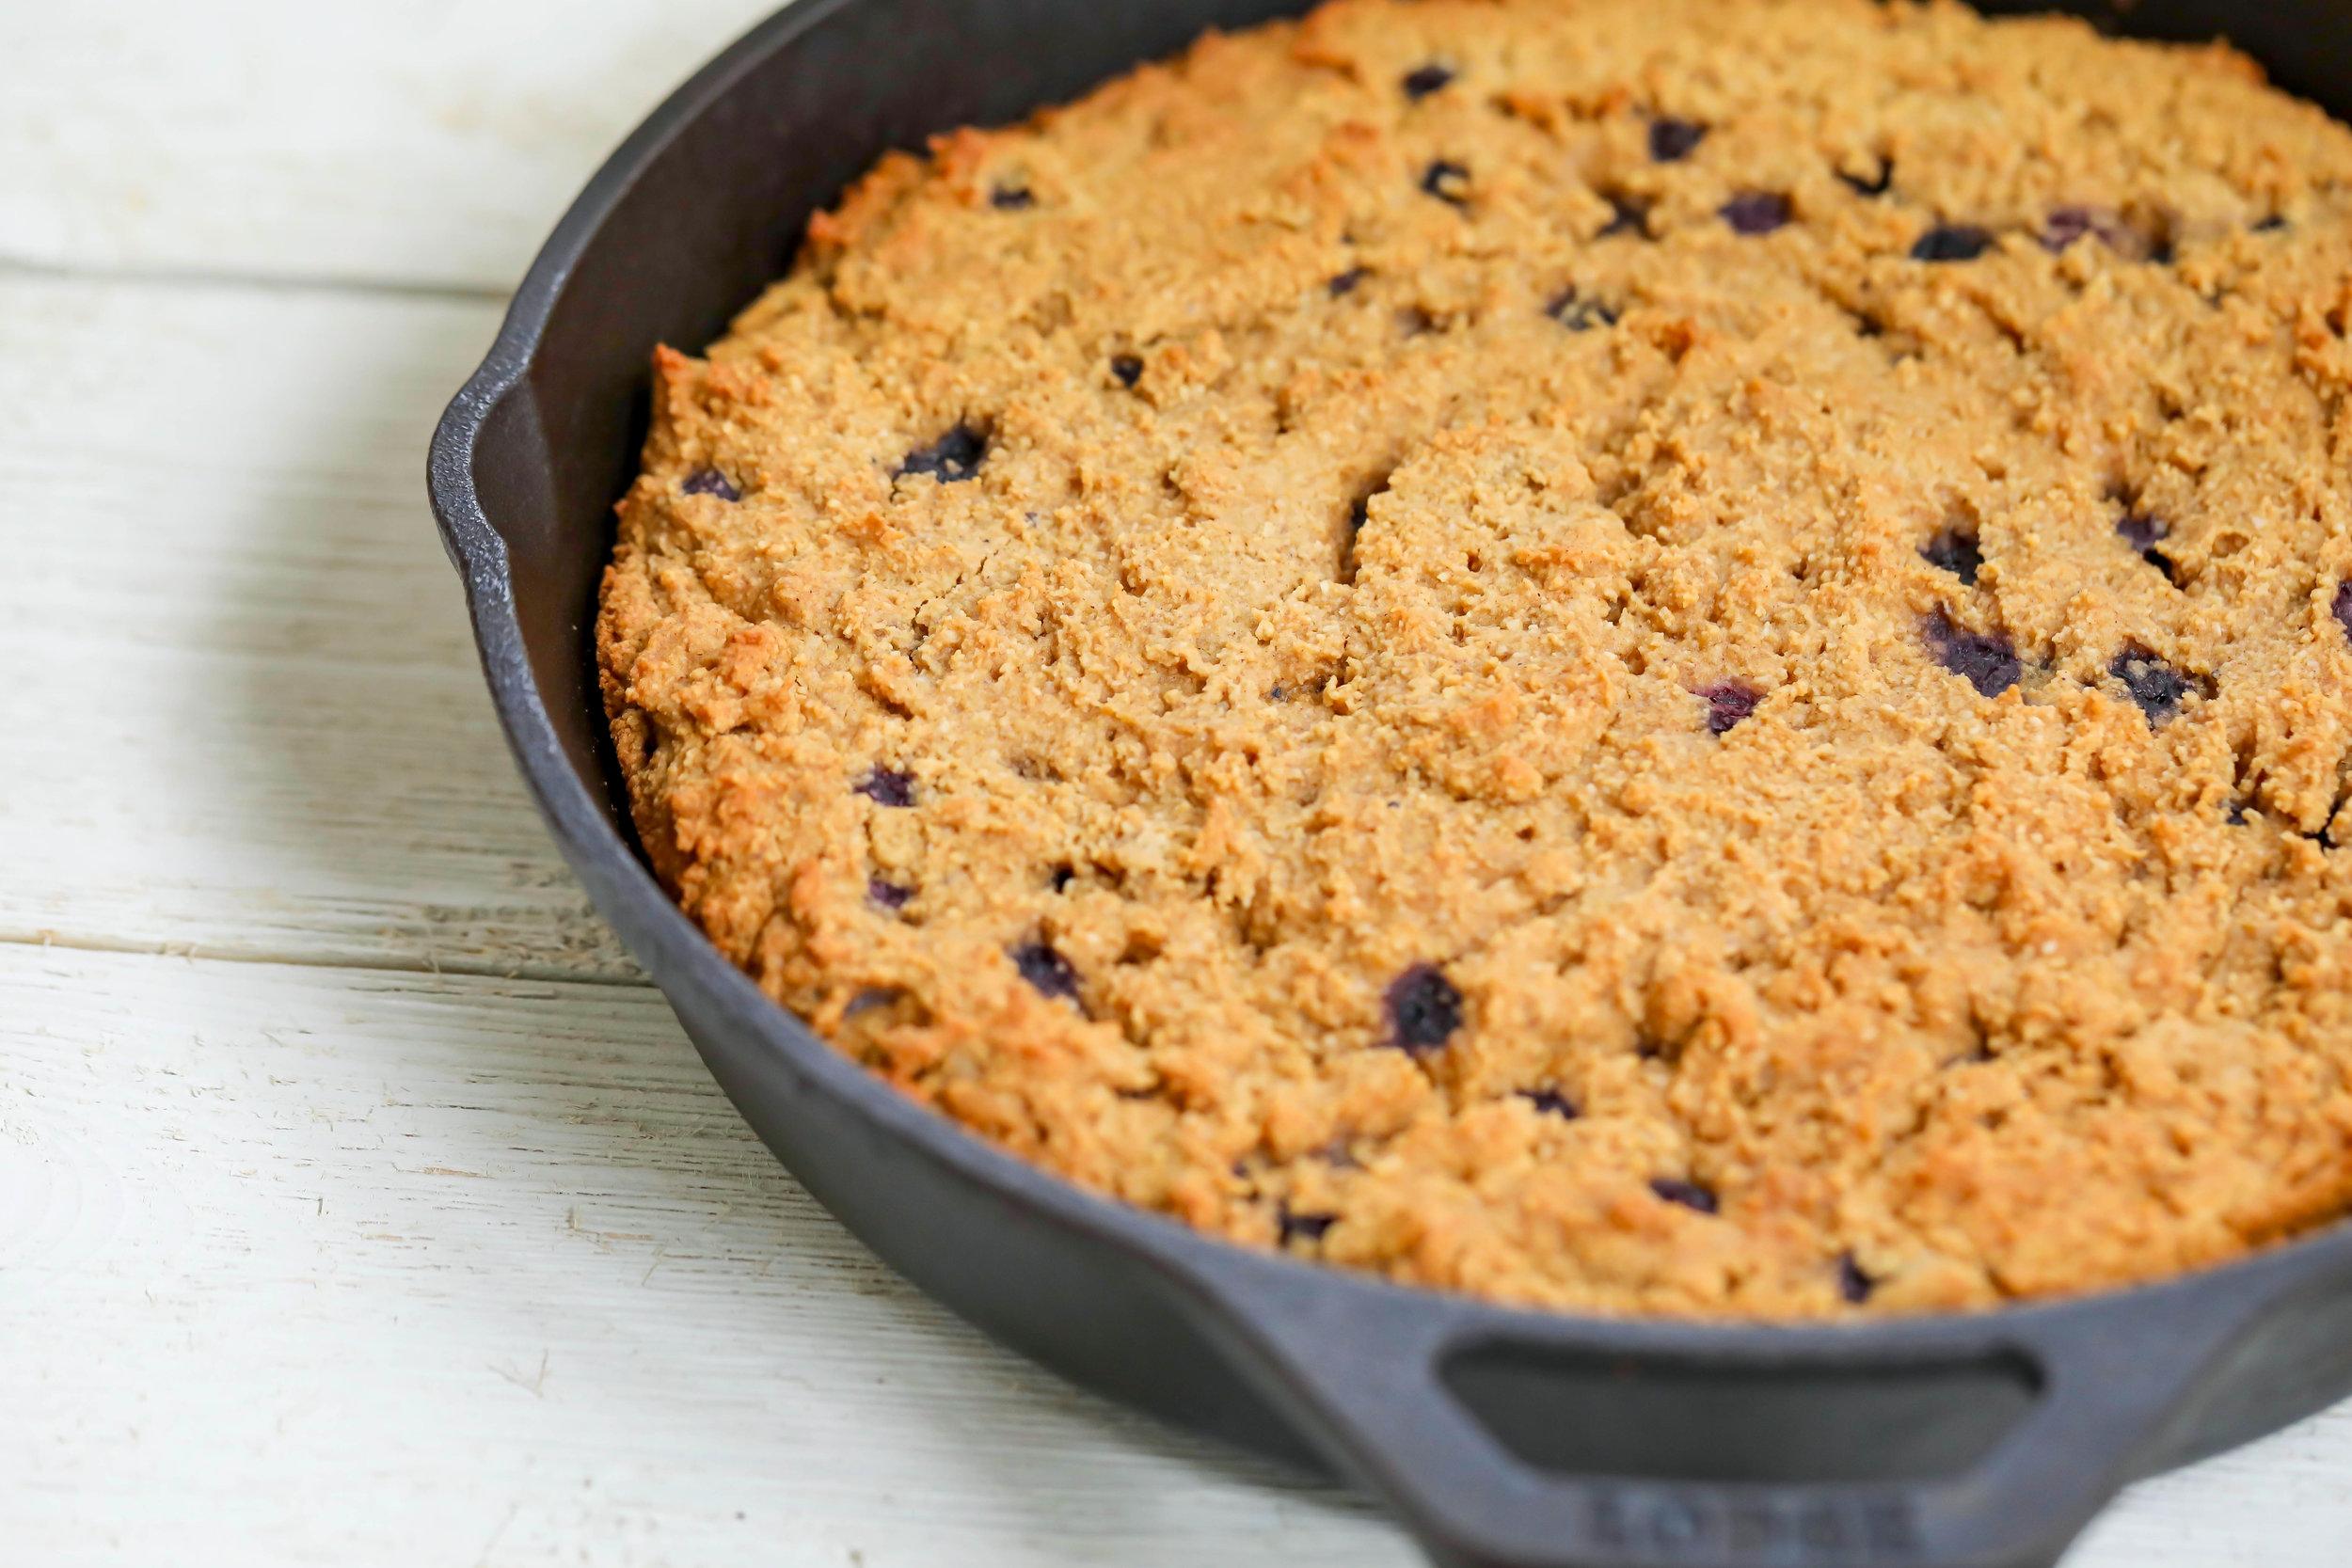 Grain-Free Blueberry Skillet Bread